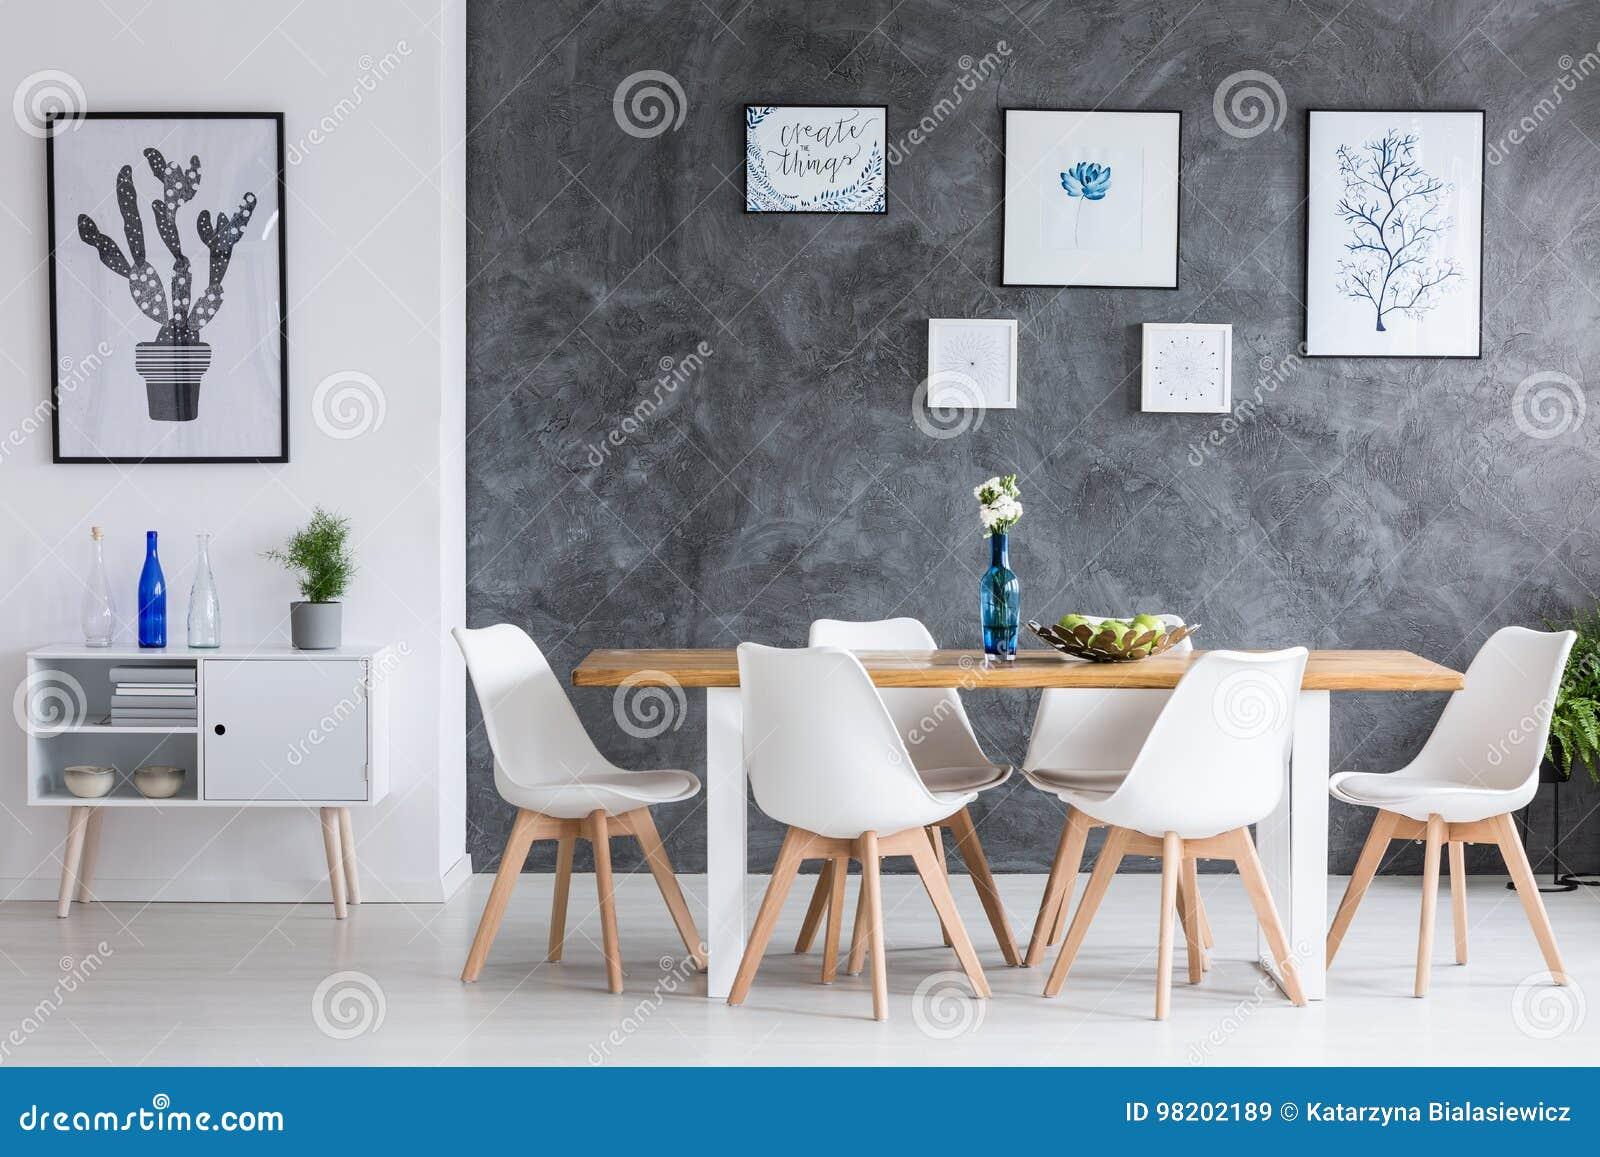 Comedor minimalista imagen de archivo. Imagen de interior - 98202189